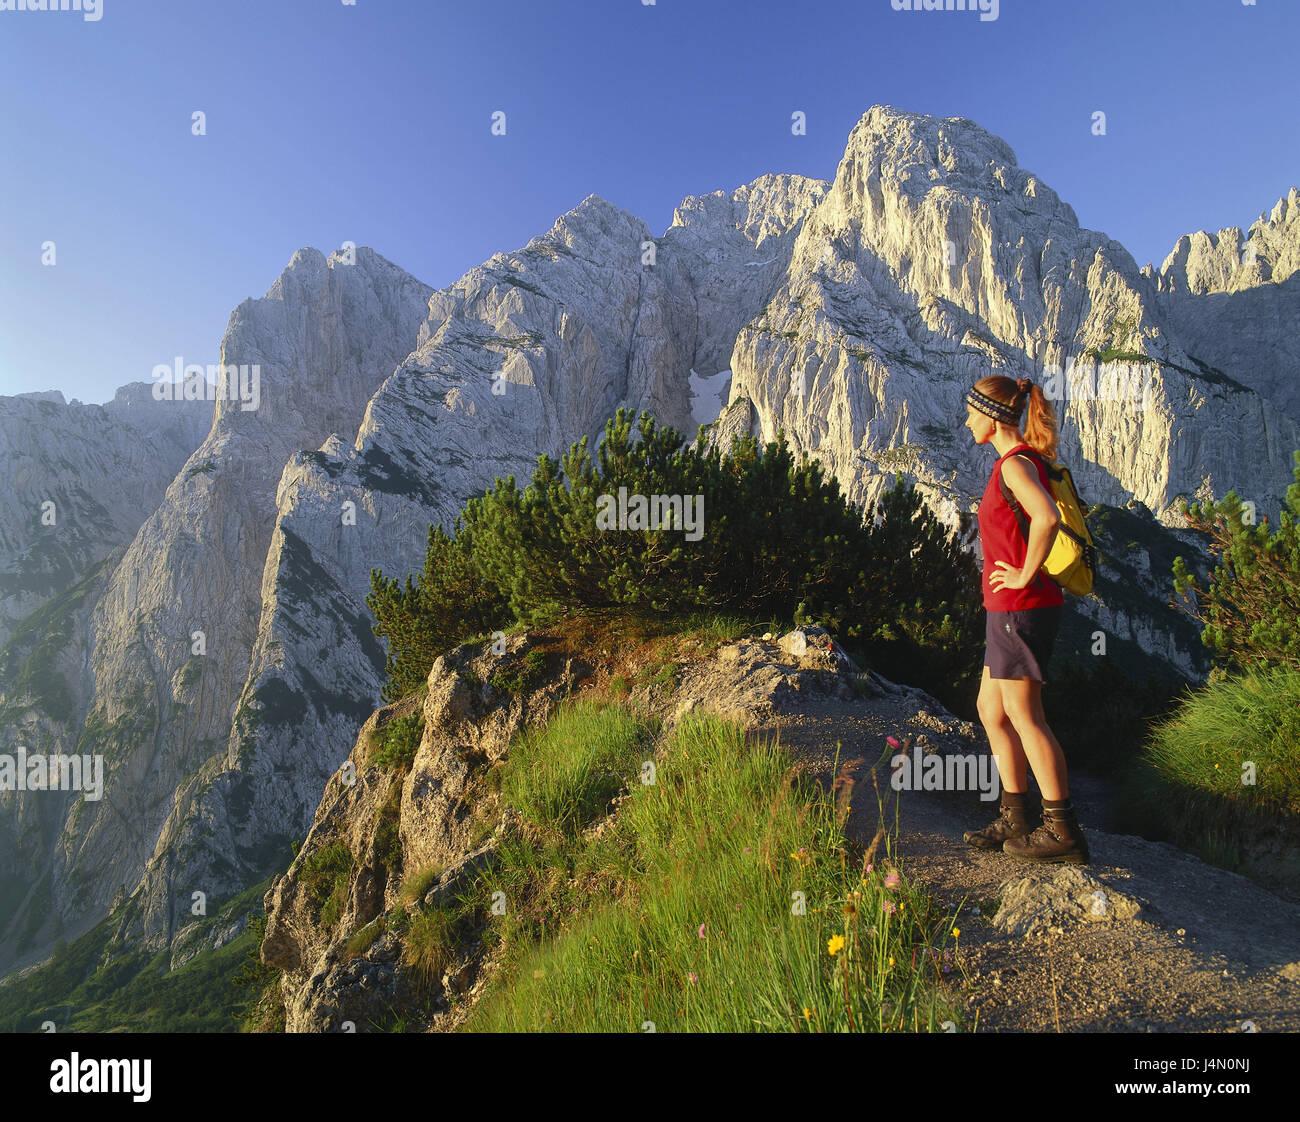 Austria, Tyrol, Kaisergebirge, traveller, view, enjoy, no model release, person, vacation, leisure time, hobby, Stock Photo